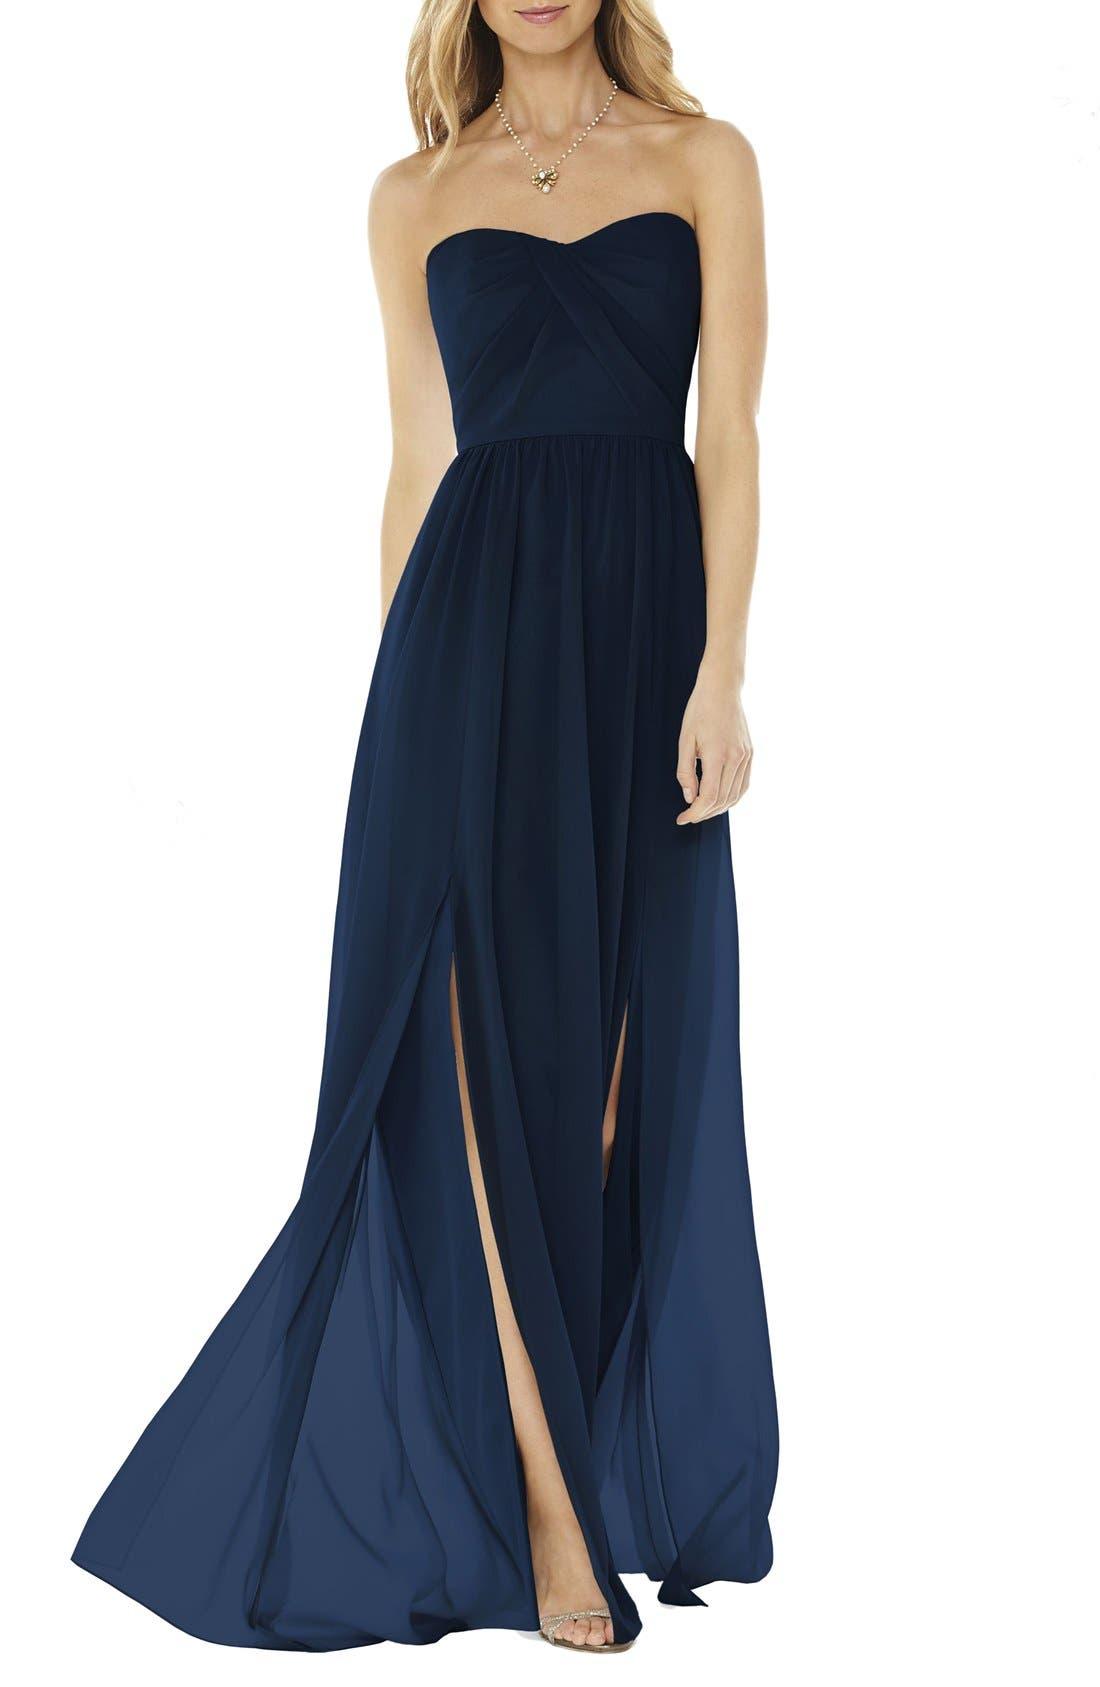 Steel Blue Prom Dresses